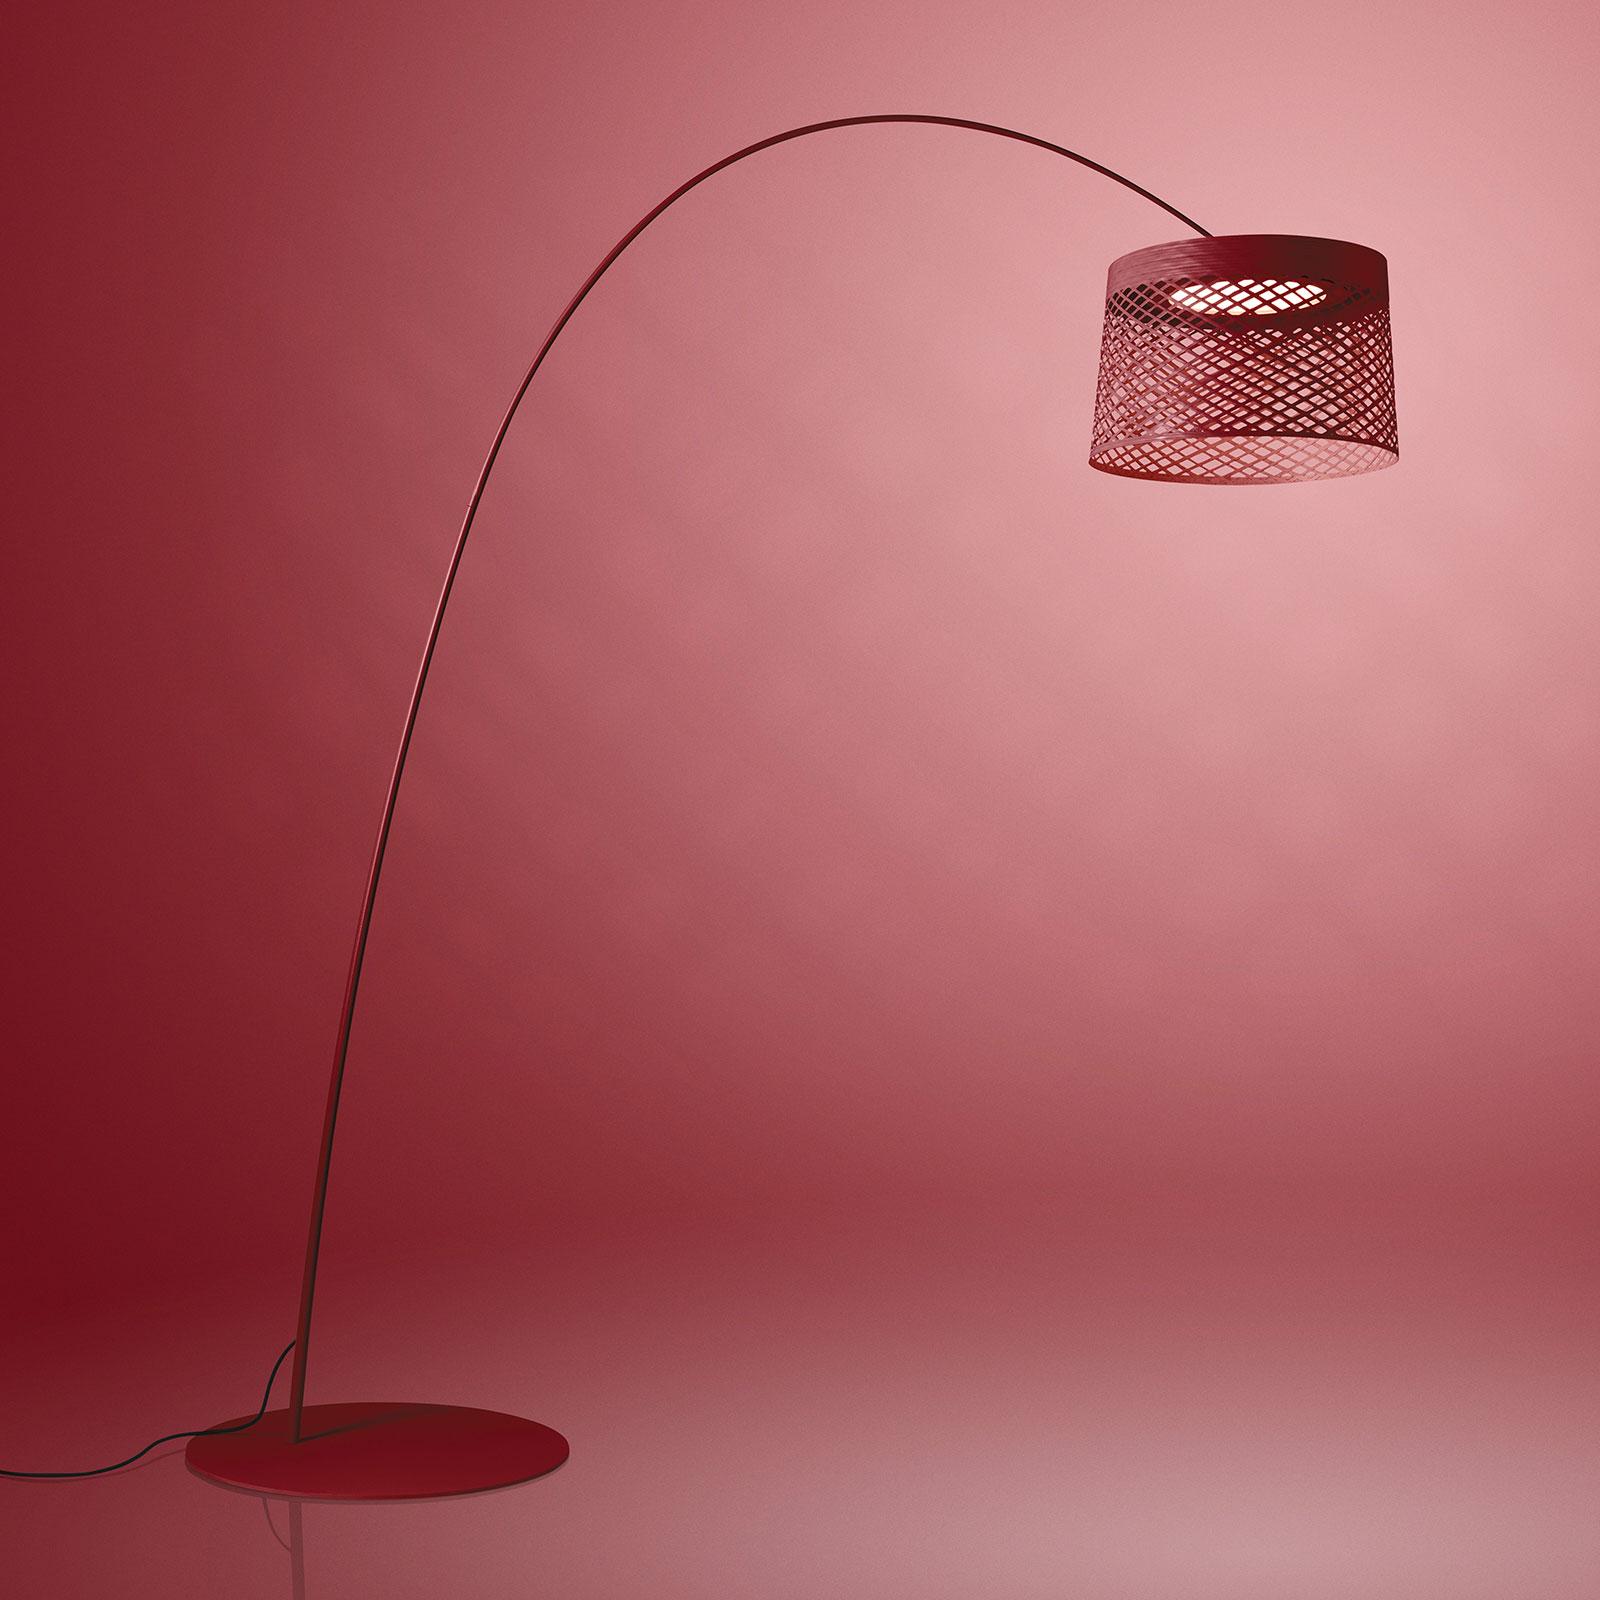 Foscarini Twiggy Grid LED-Bogenleuchte, karminrot